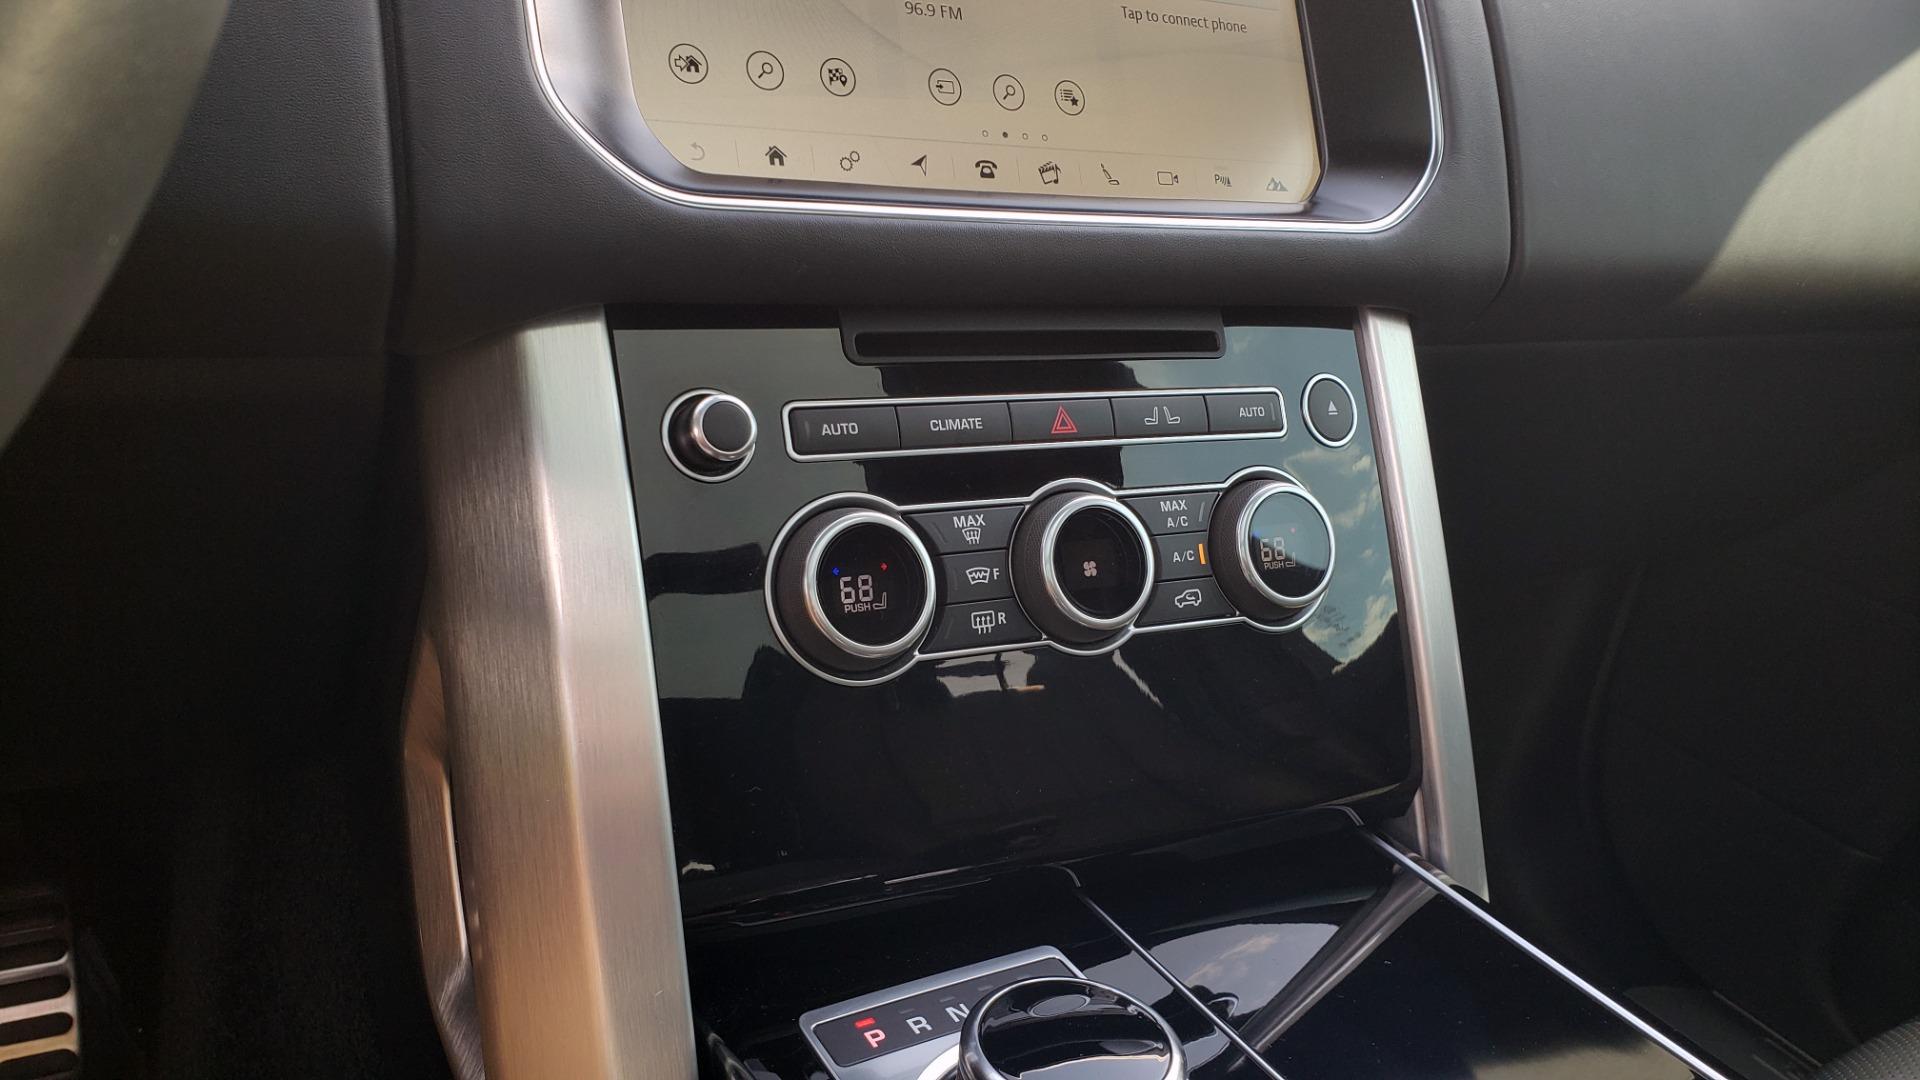 Used 2017 Land Rover RANGE ROVER SC V8 / VISION ASST / DRIVE PKG / MERIDIAN SOUND / PANO-ROOF / NAV / BSM for sale $75,995 at Formula Imports in Charlotte NC 28227 57